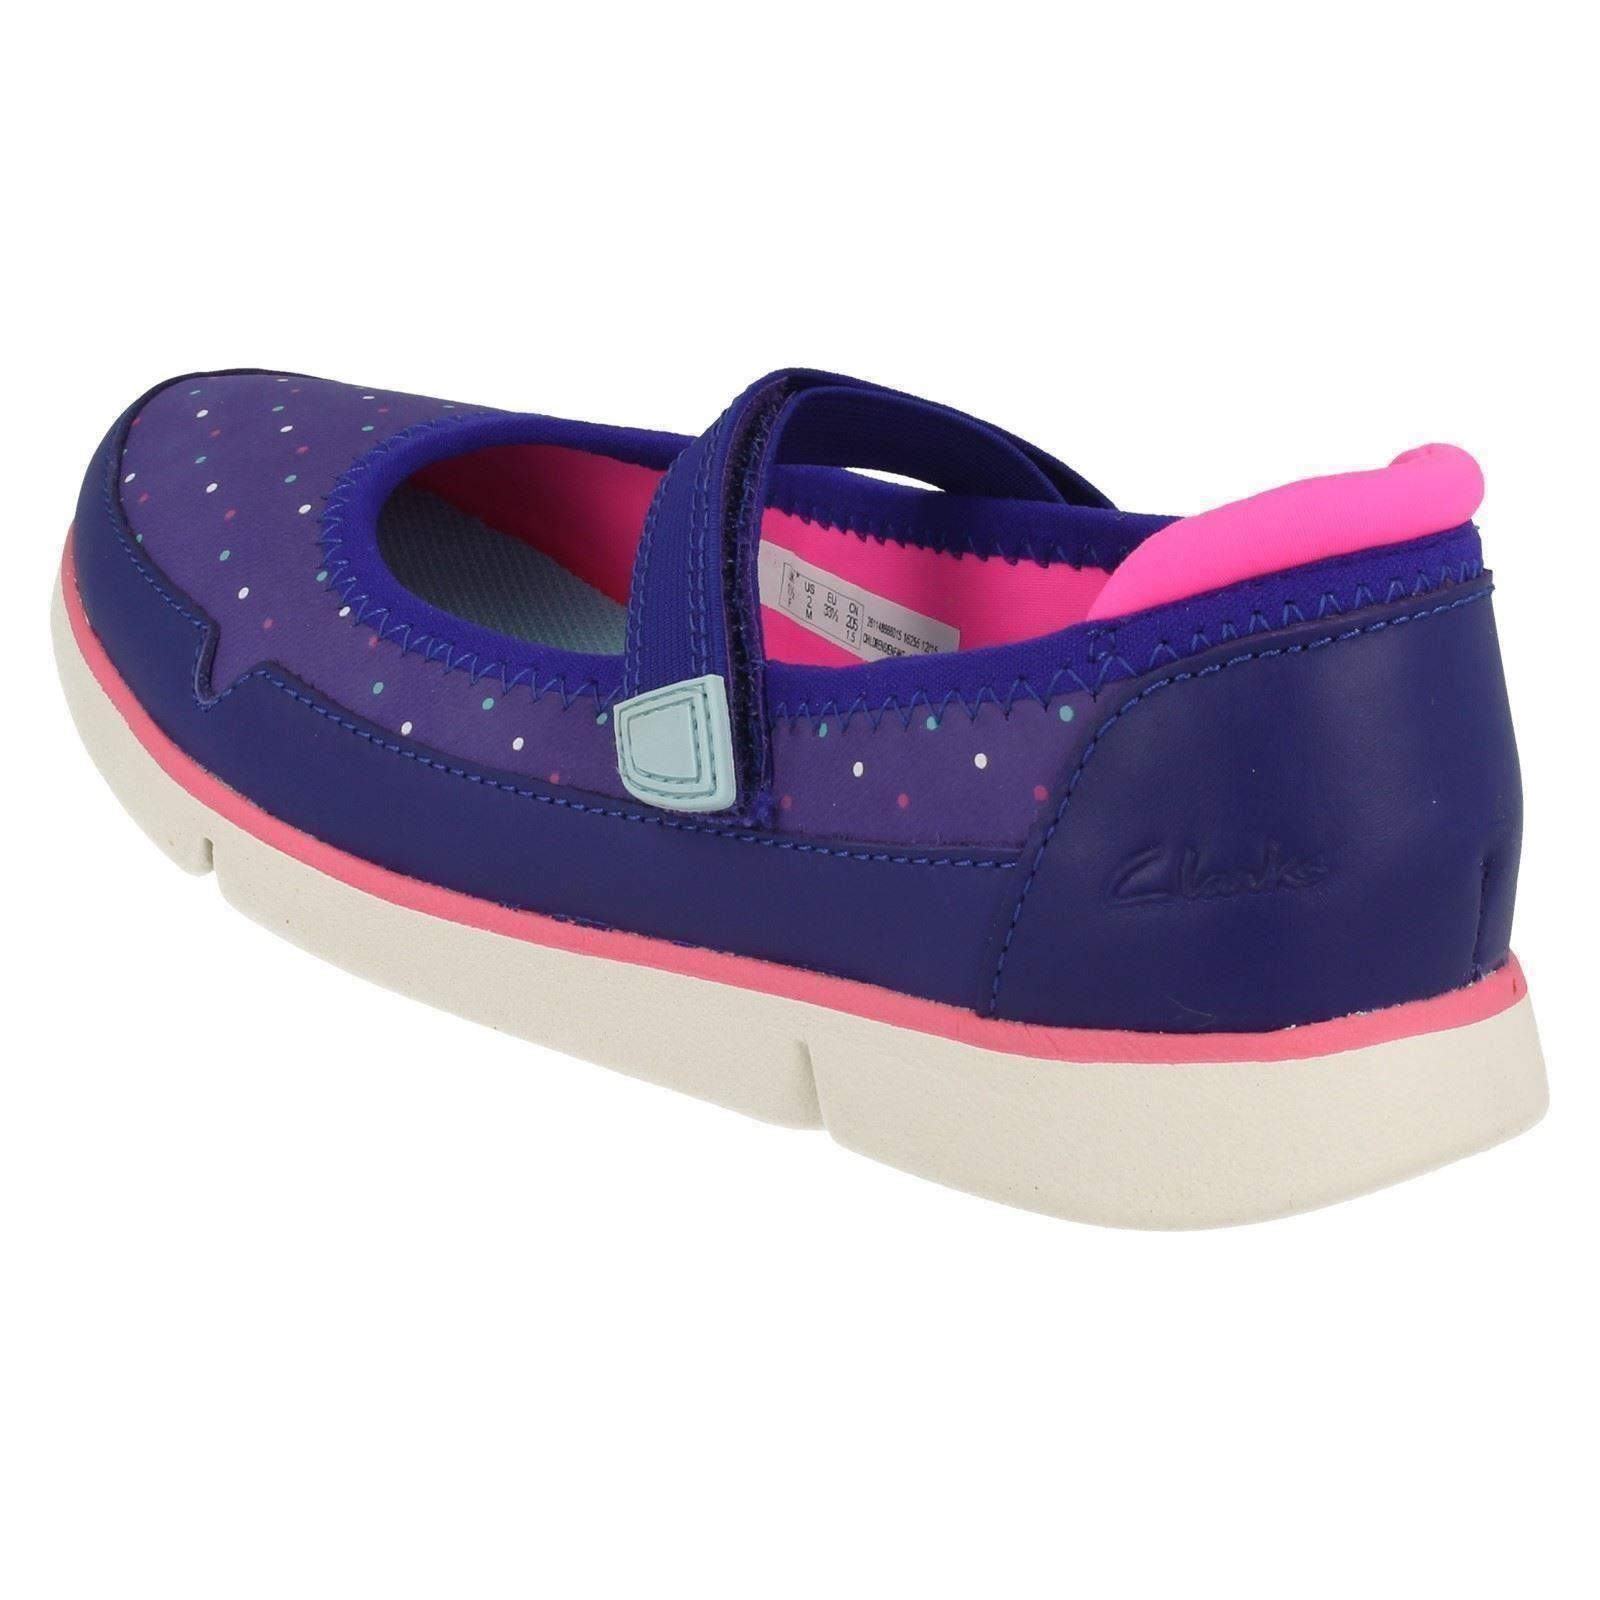 Chicas Clarks ligero Informal Zapatos Bitsey Tri